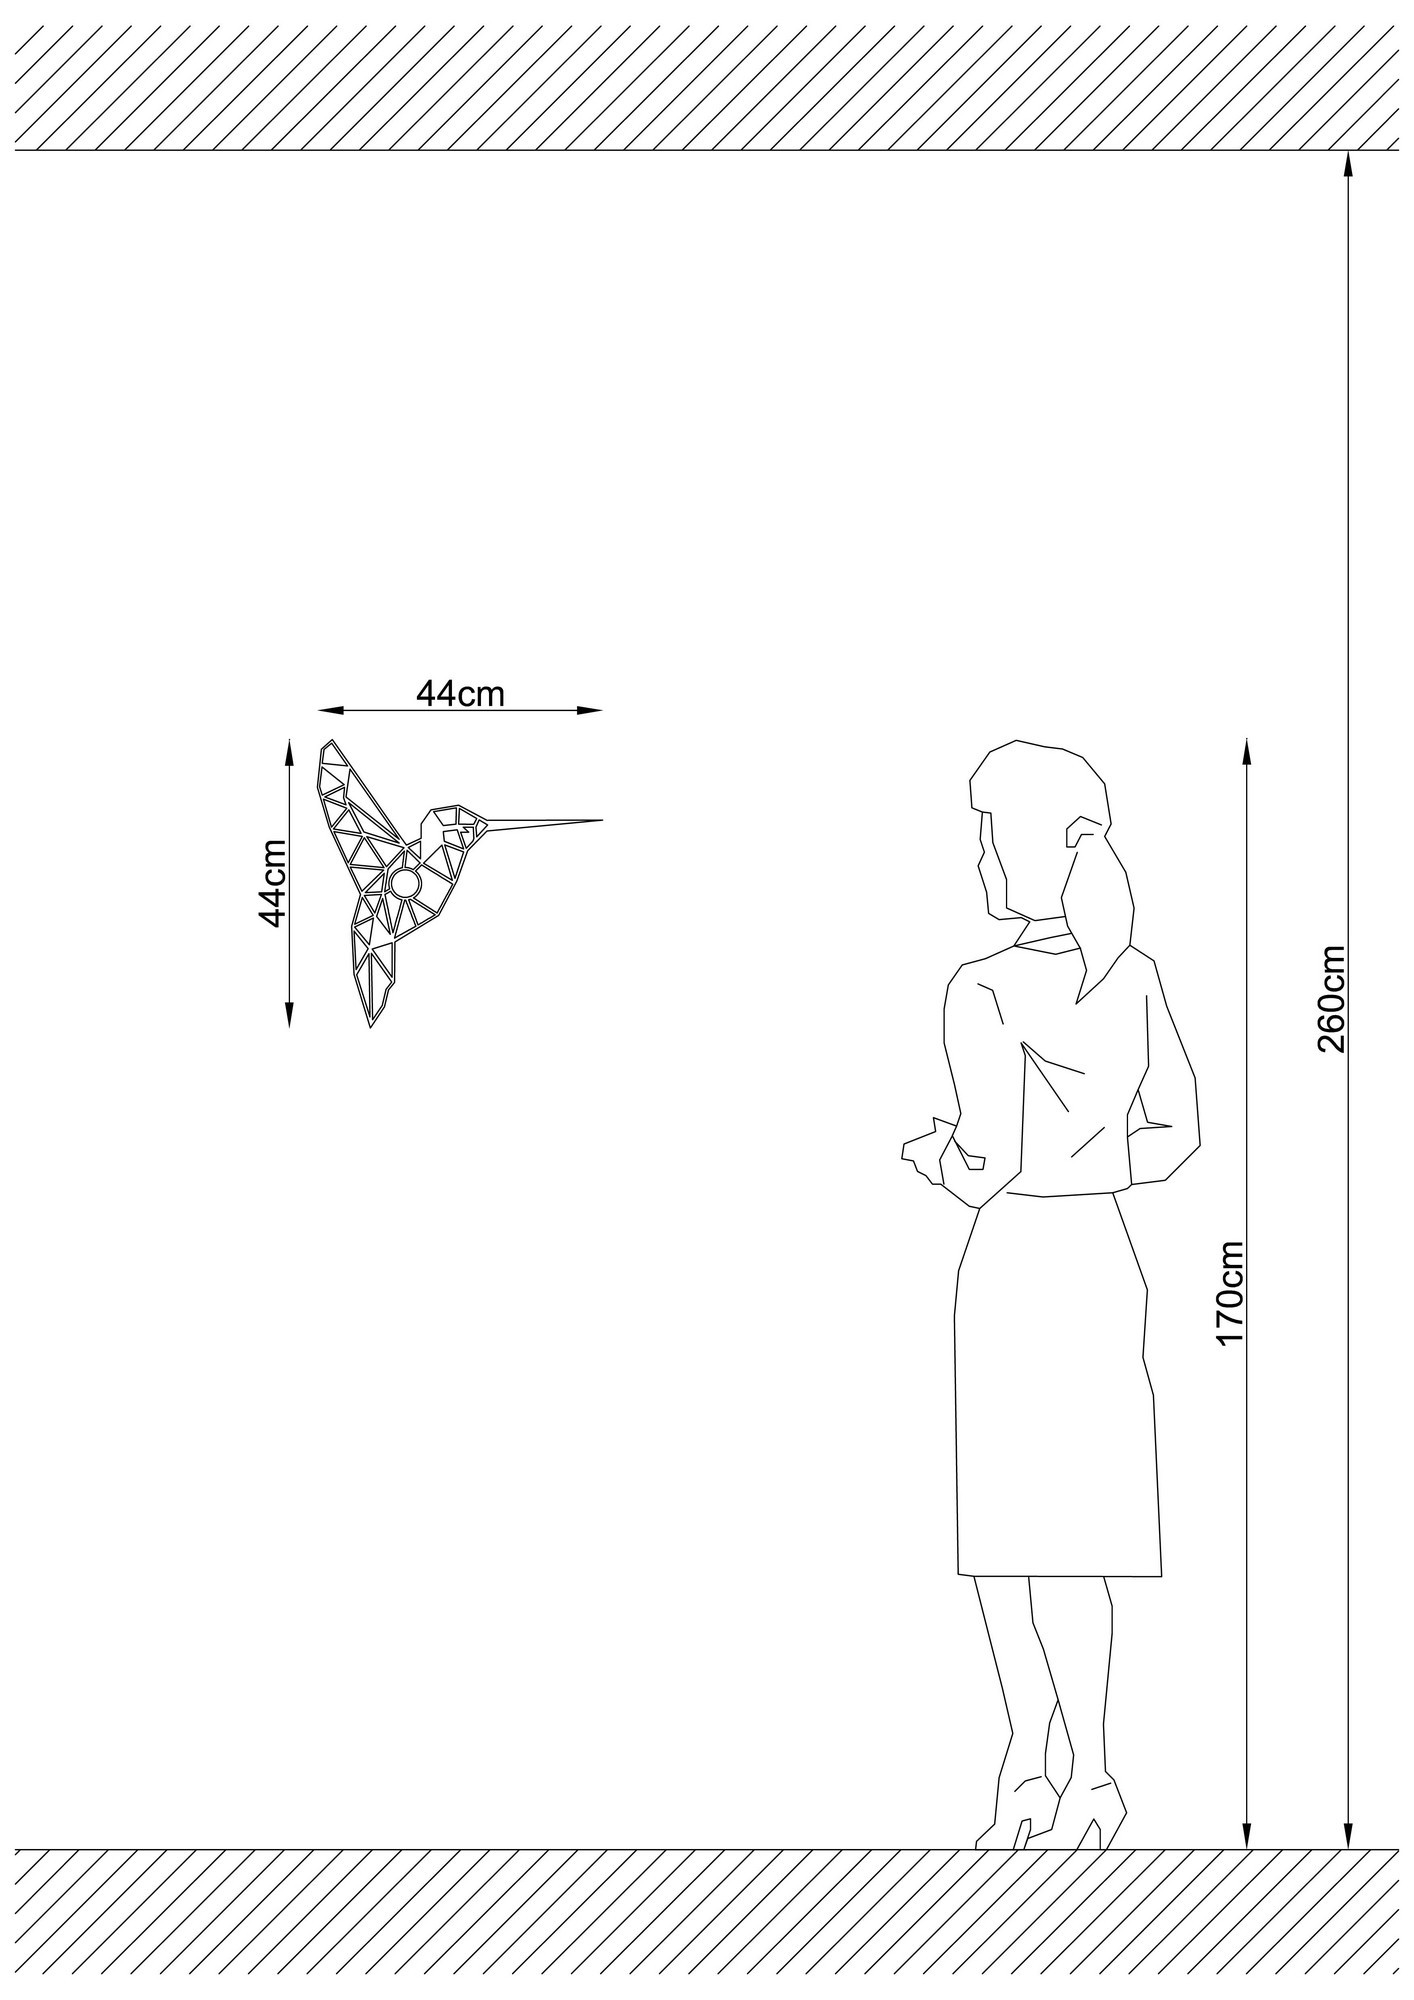 LED industriële wanddeco lamp dieren - Kolibrie - vogel - dimbaar - E27 fitting - afmetingen